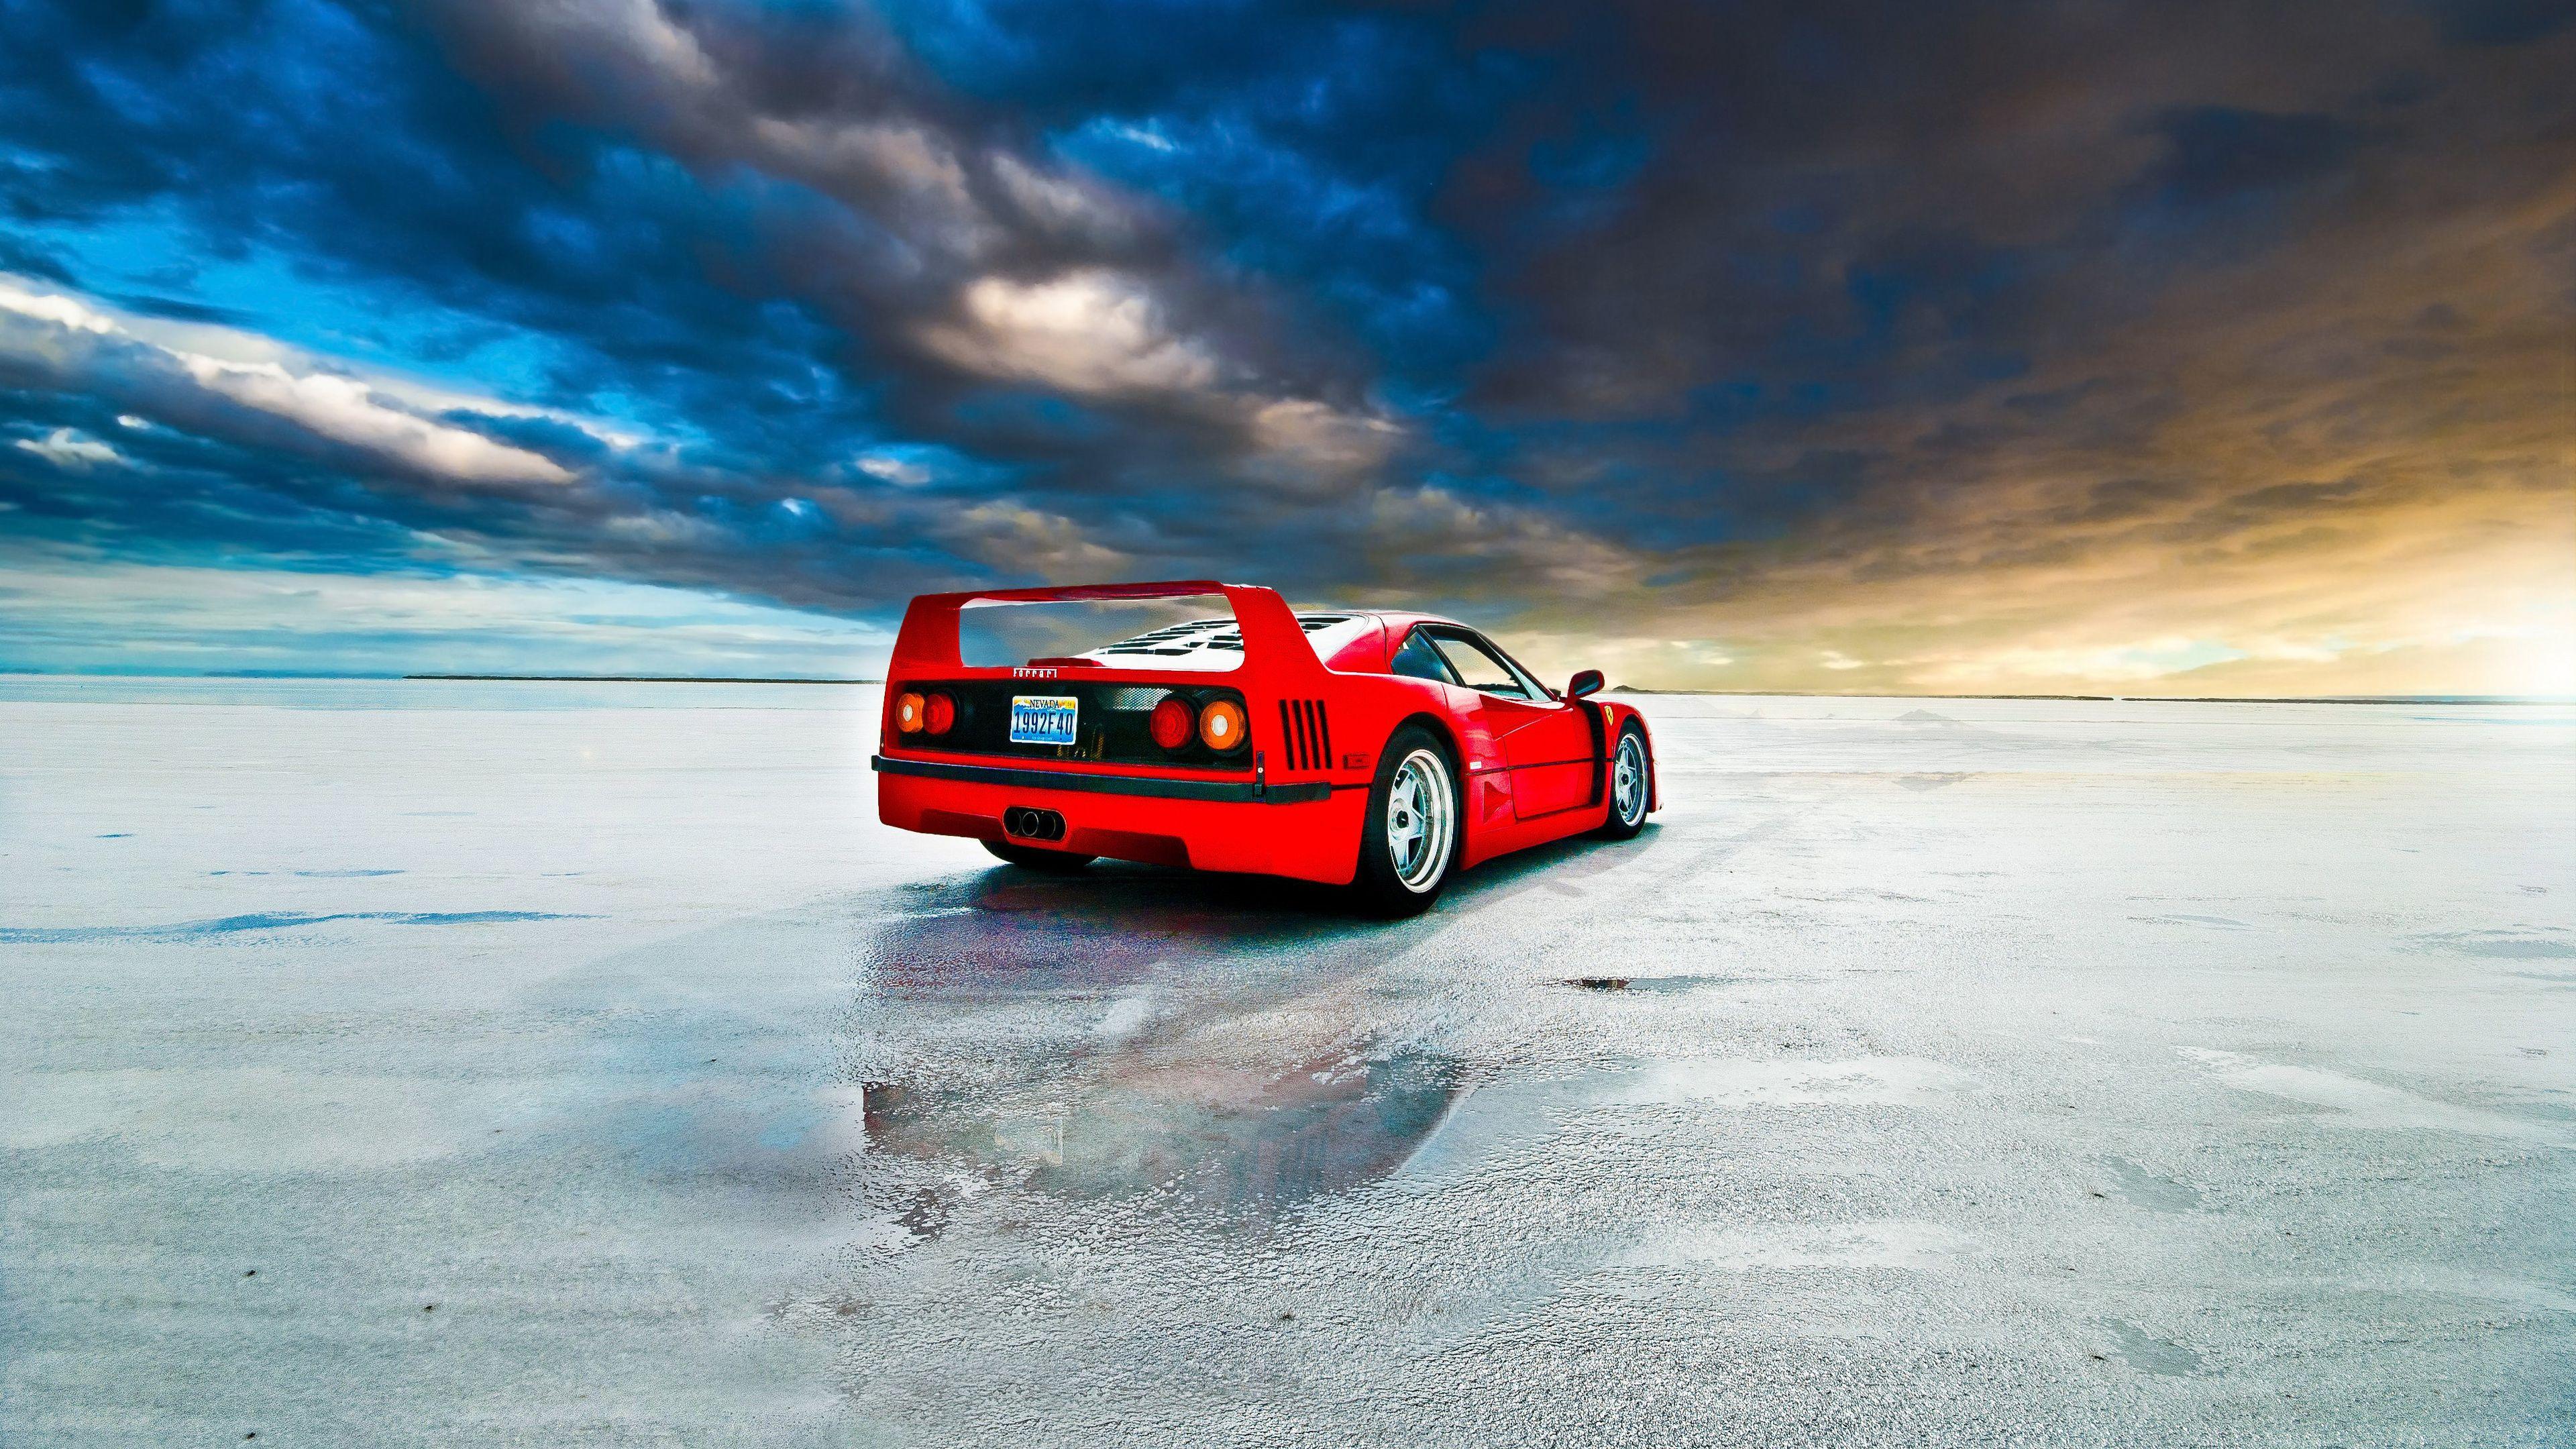 Wallpaper 4k Ferrari F40 4k Wallpapers Cars Wallpapers Ferrari